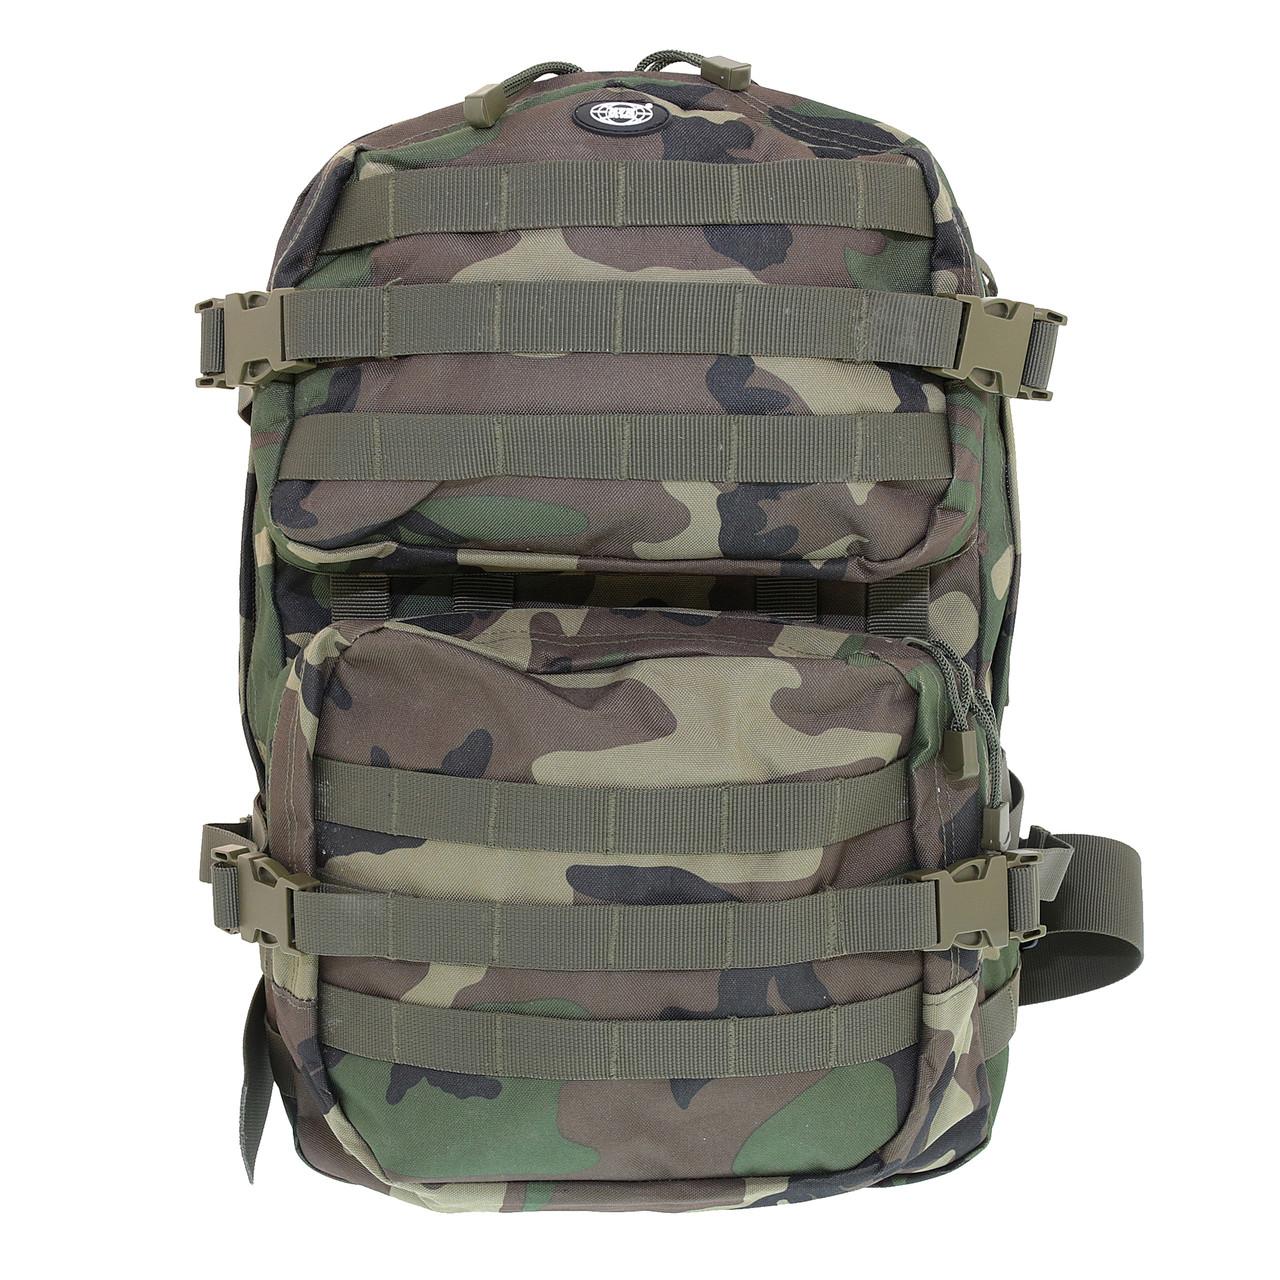 Рюкзак тактичний 40 літрів Assault II Woodland, Max Fuchs 30343T